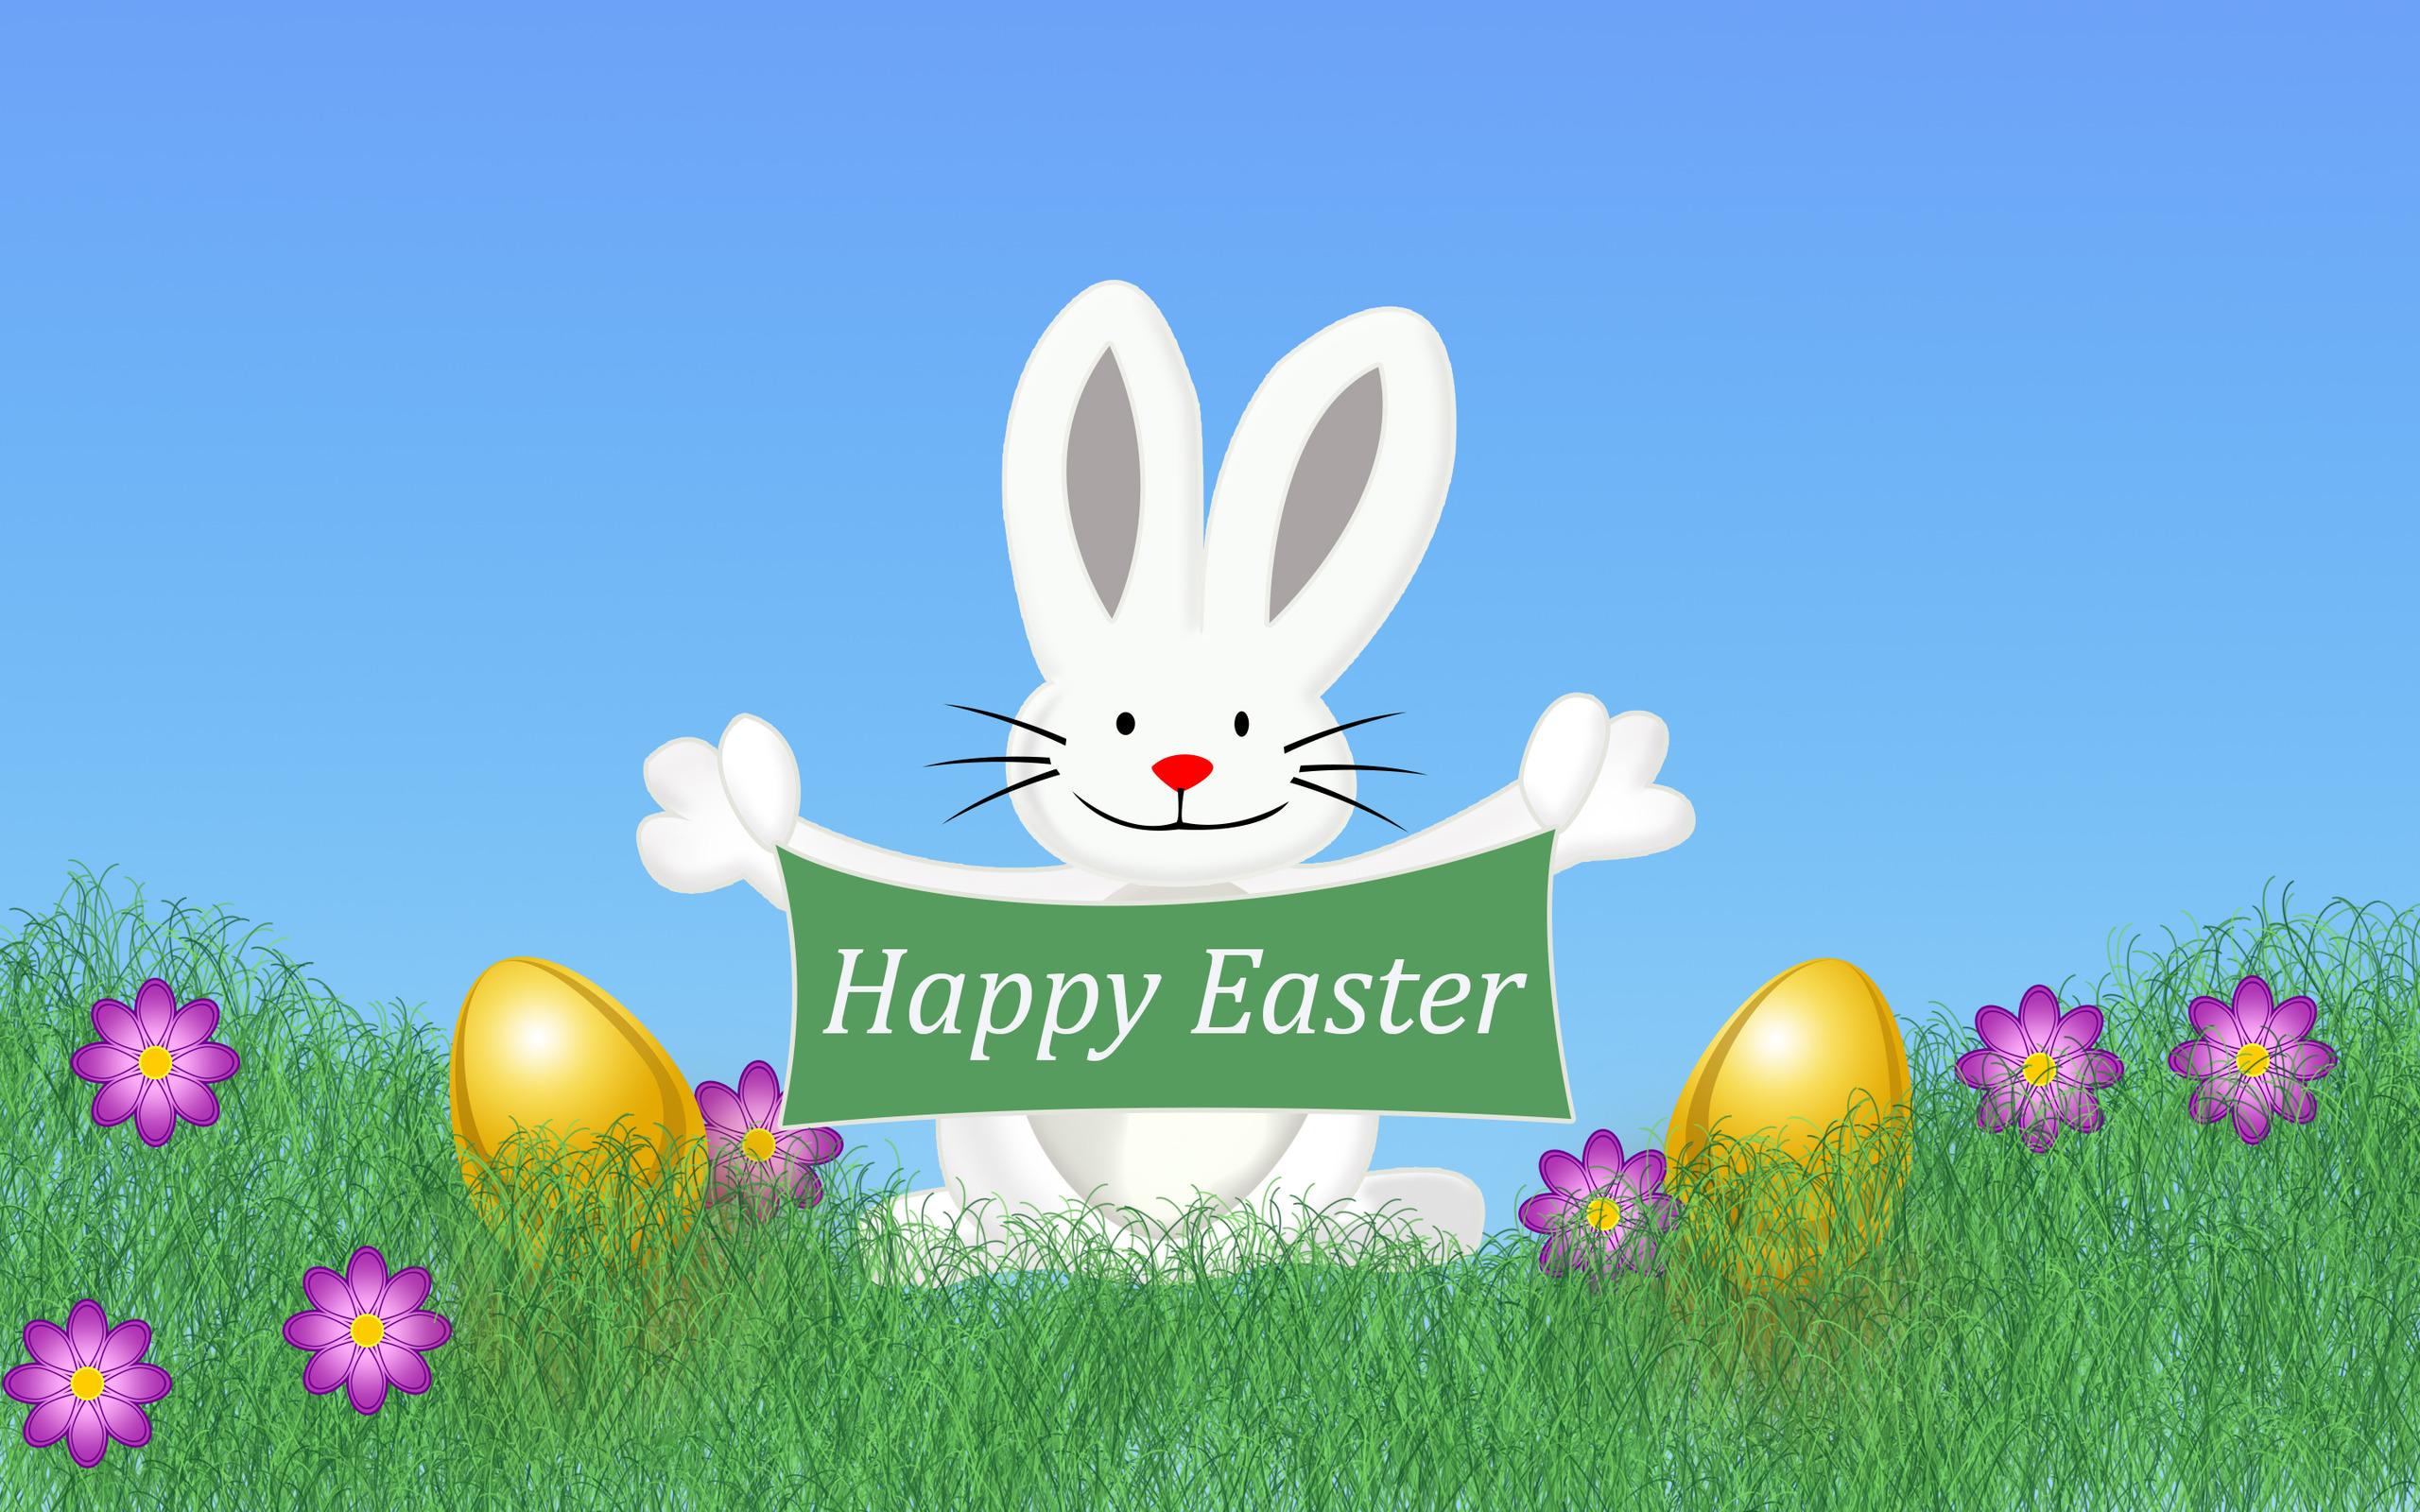 Happy Easter wallpaper 29688 2560x1600